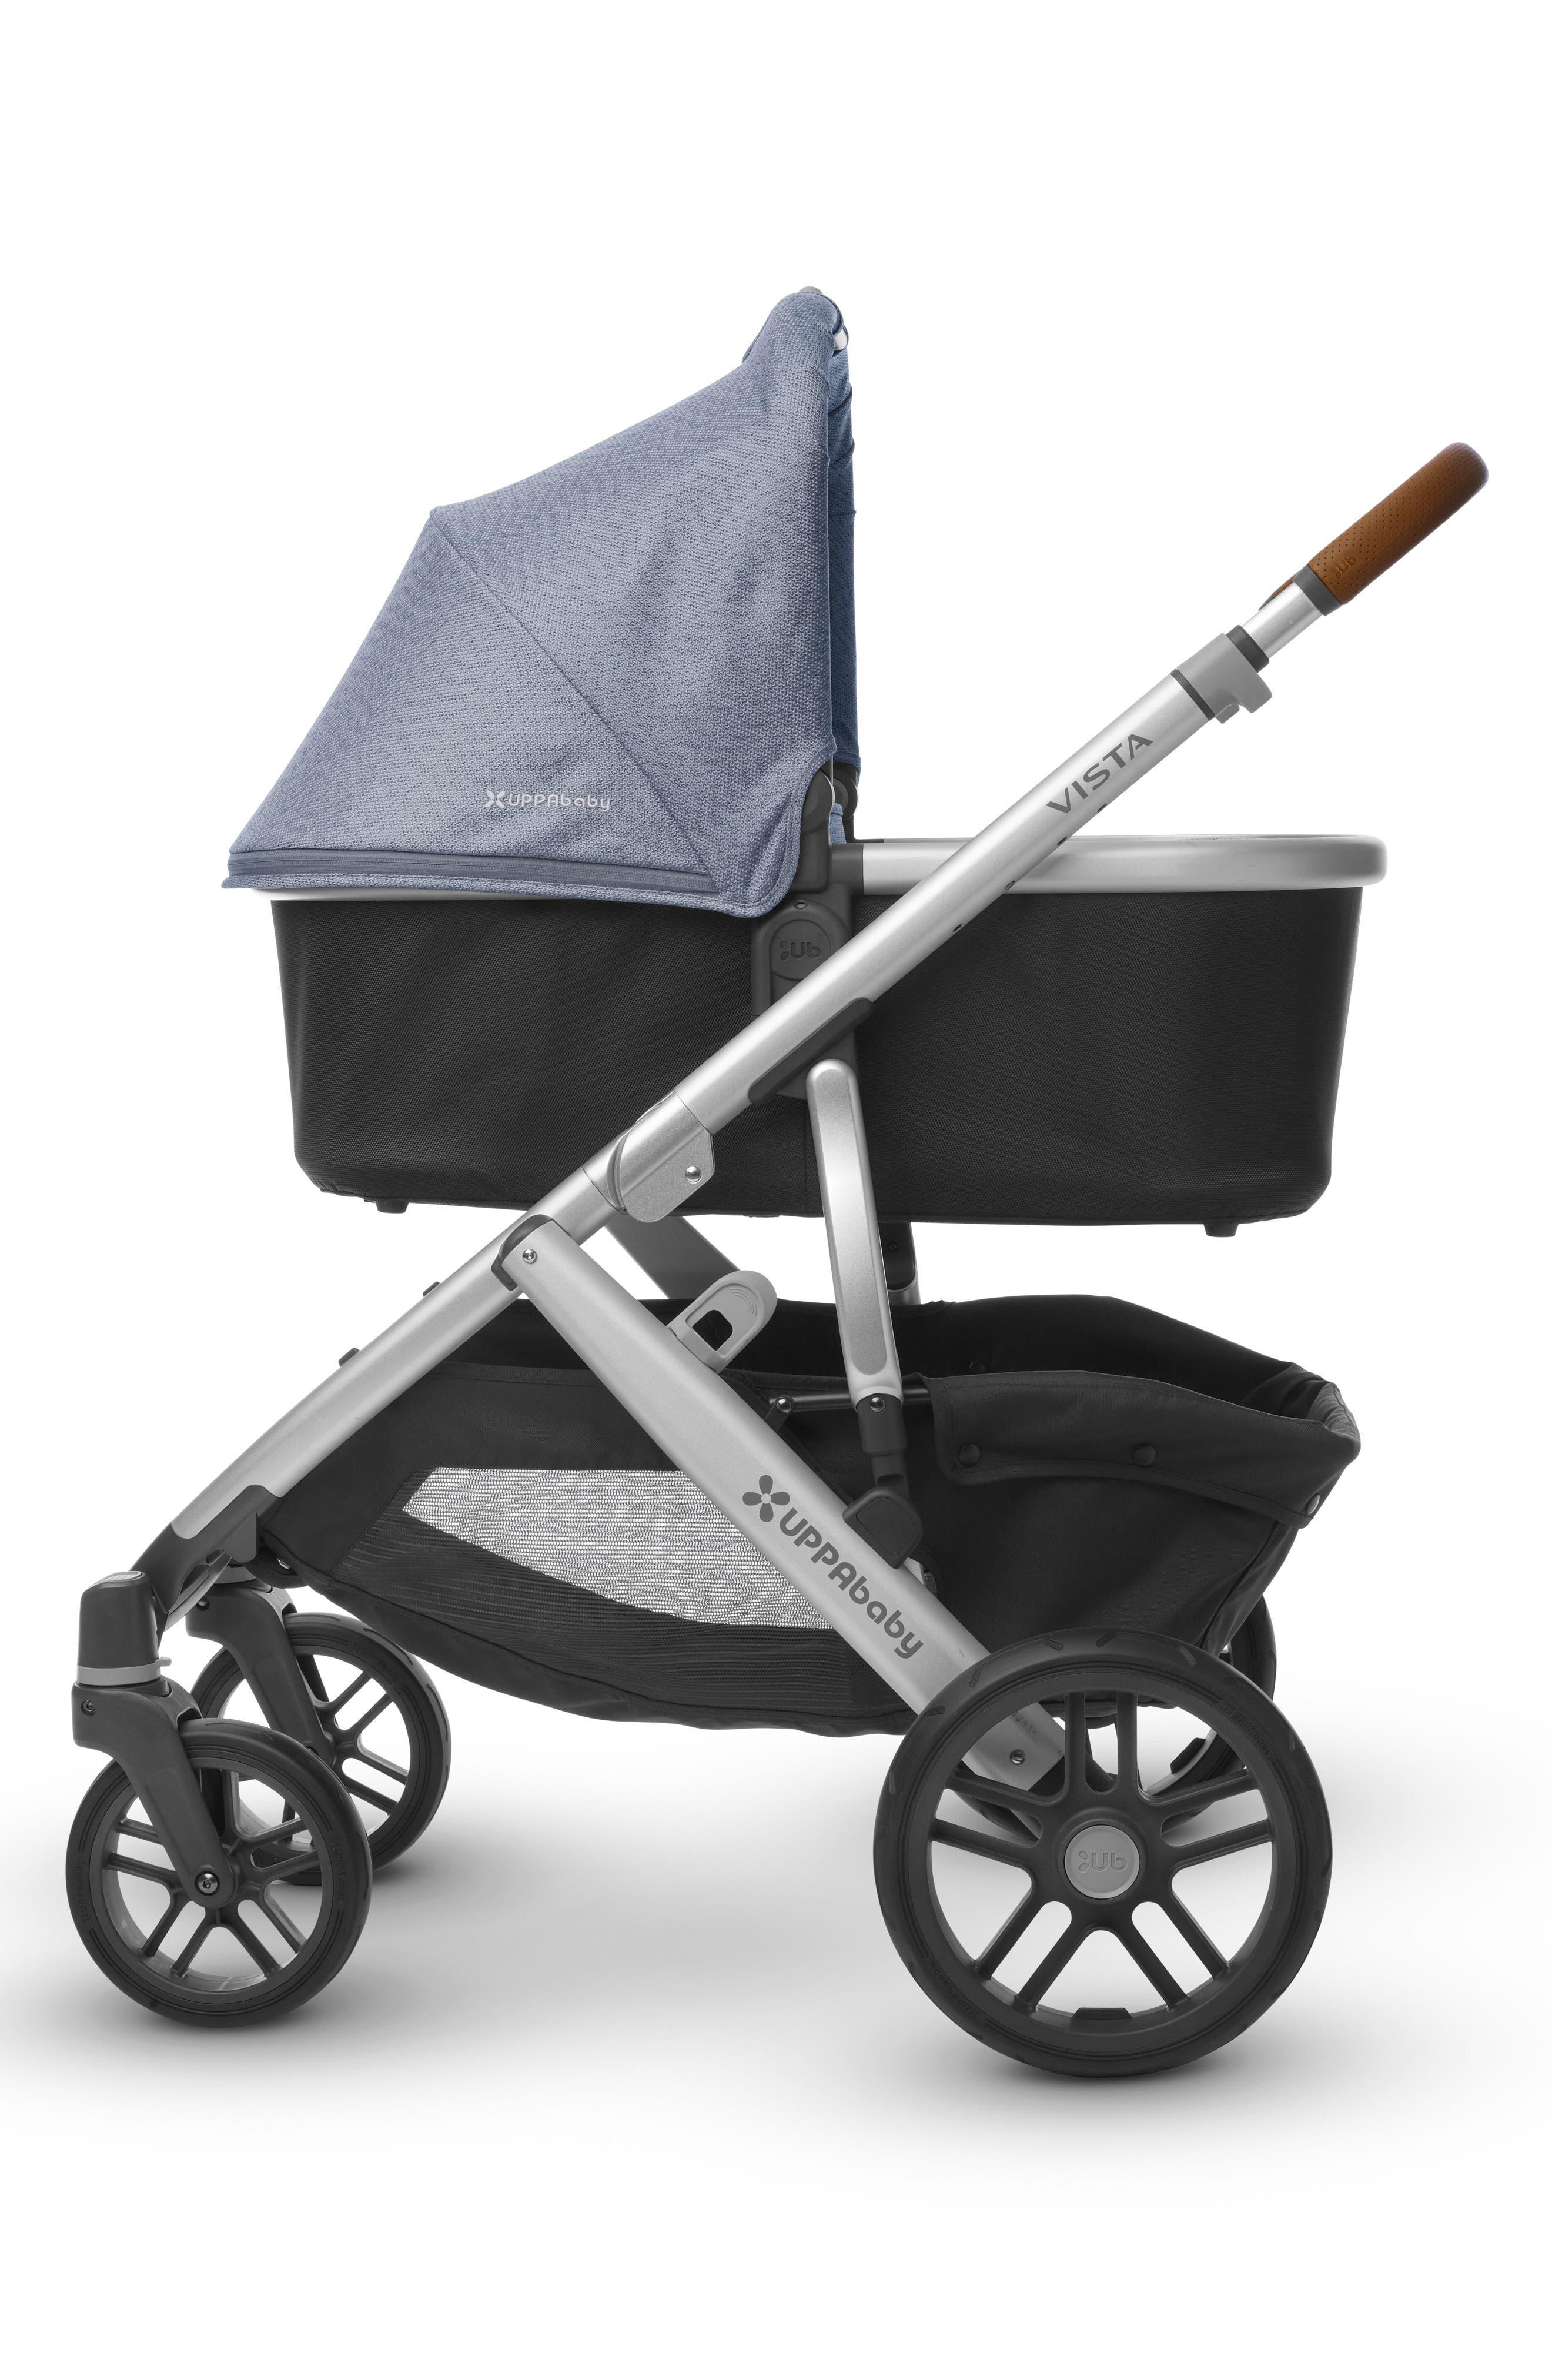 2017 VISTA Henry Aluminum Frame Convertible Stroller with Bassinet & Toddler Seat,                             Alternate thumbnail 3, color,                             Blue Marl